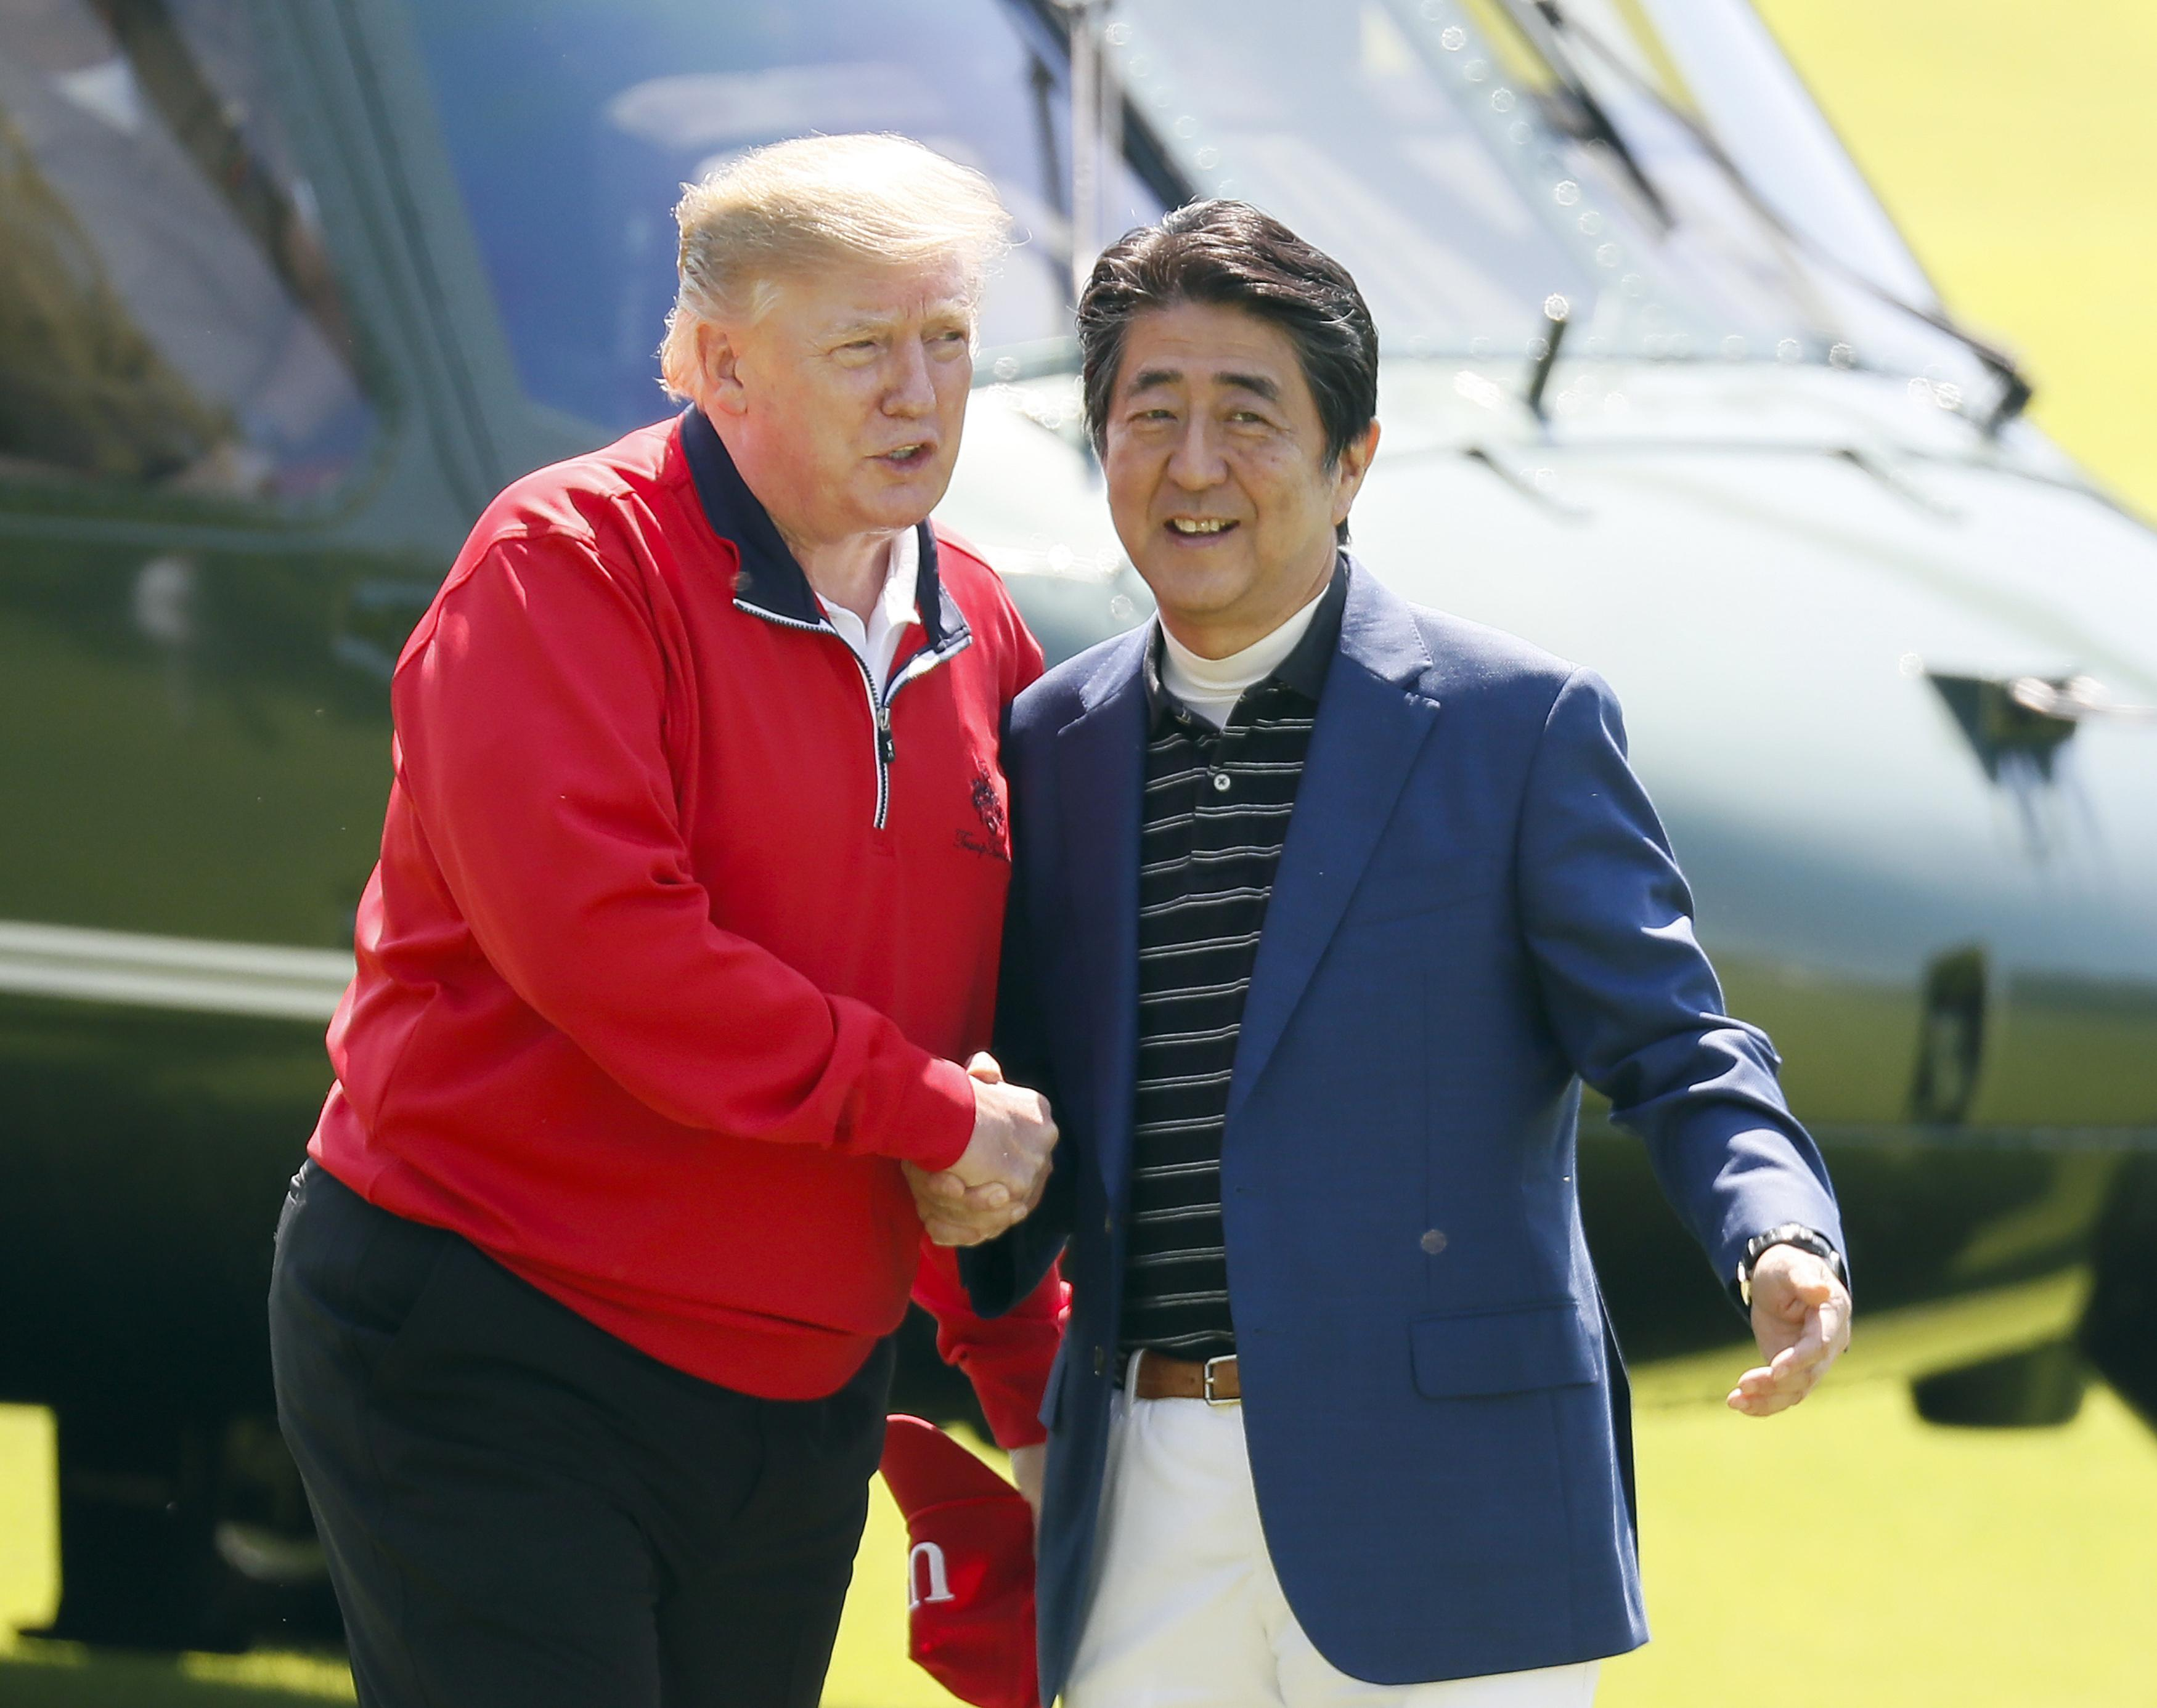 Trump's 'small weapons' tweet on North Korea tests threatens progress in Japan, unnerves Shinzo Abe